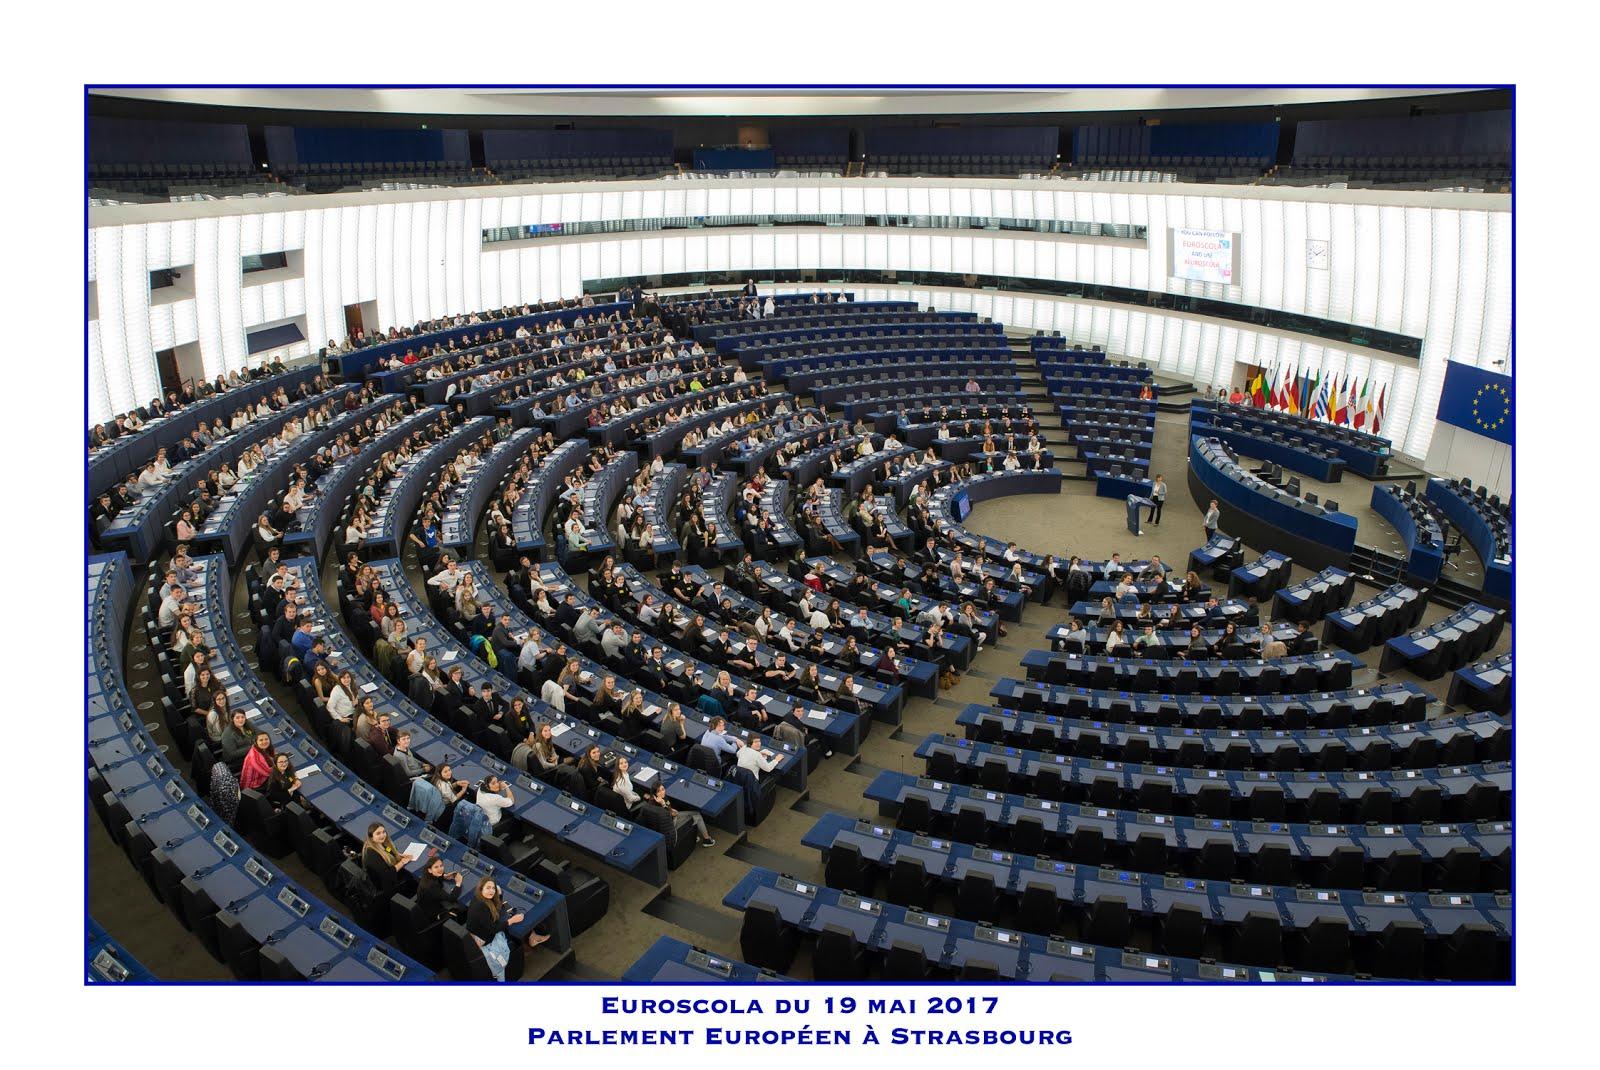 Seduta a Strasburgo